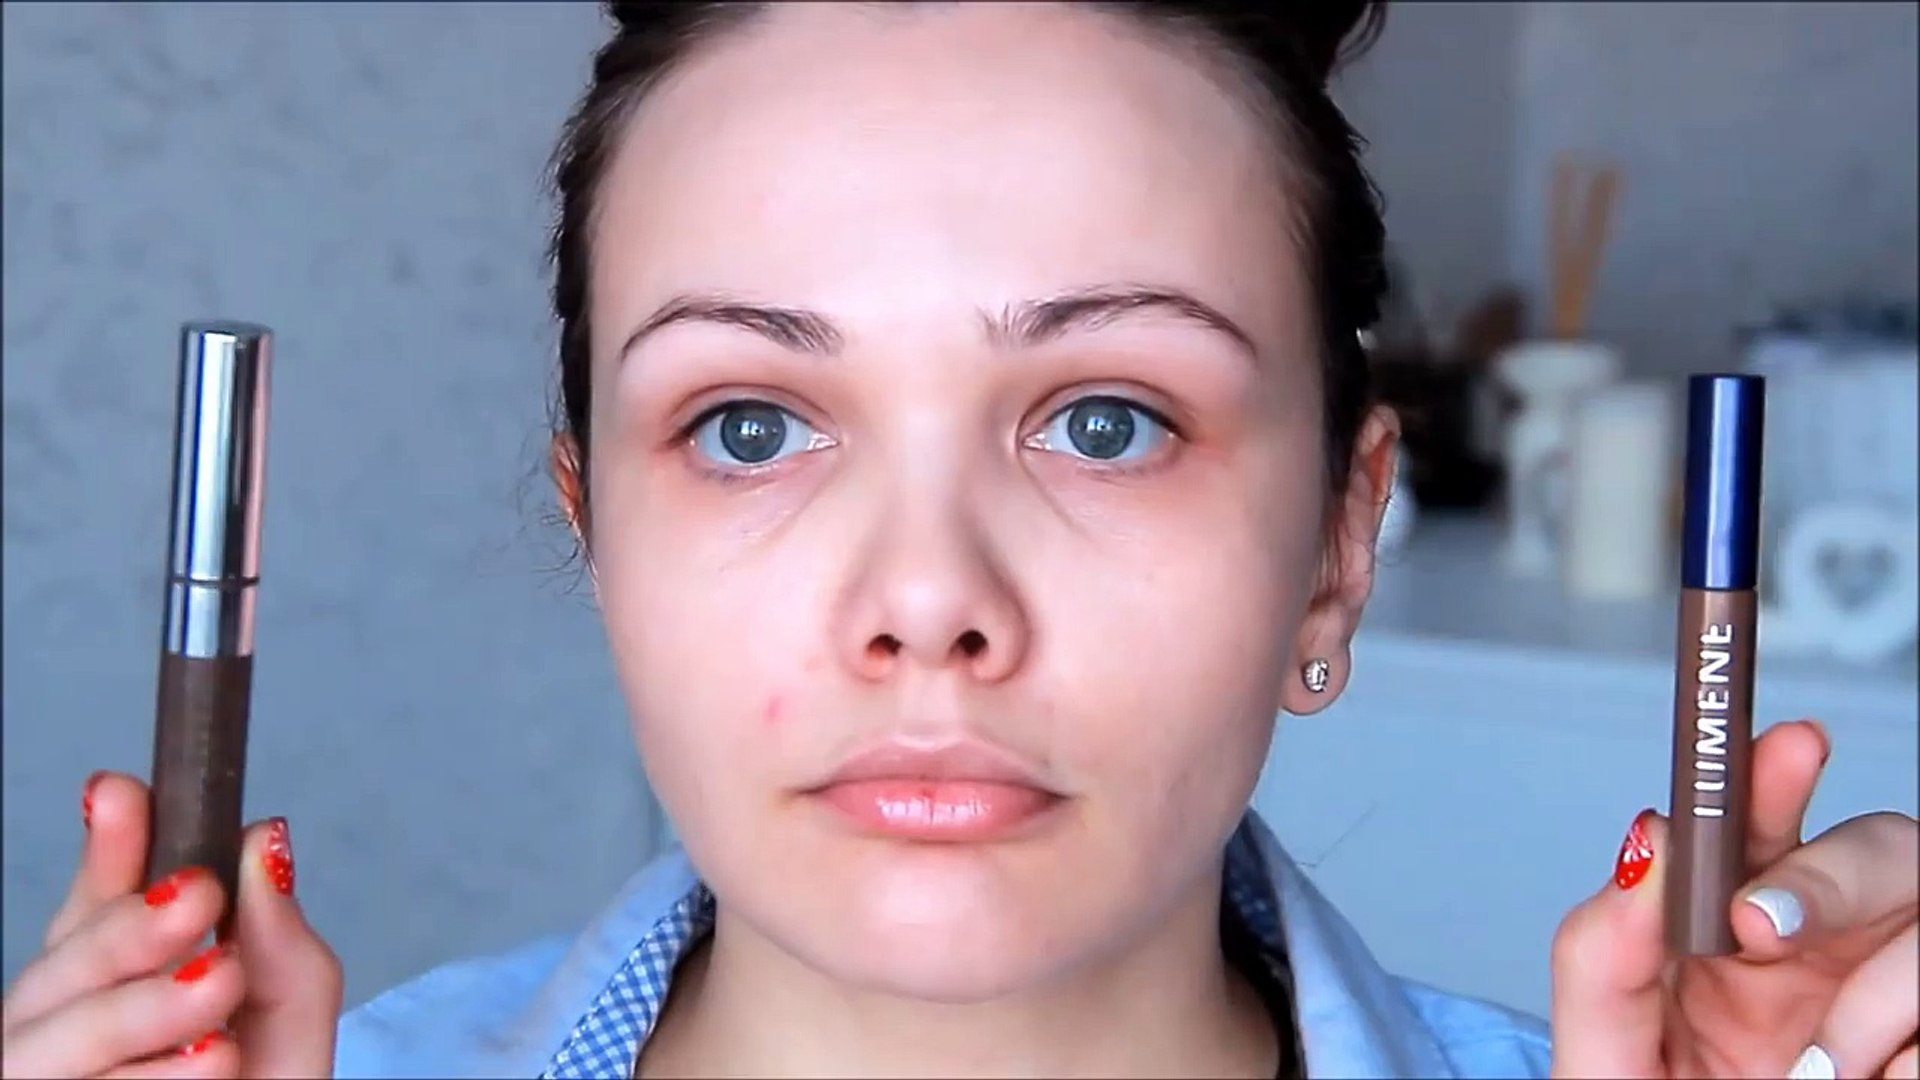 Собирайся со мной / get ready with me Ежедневный макияж / every day make up